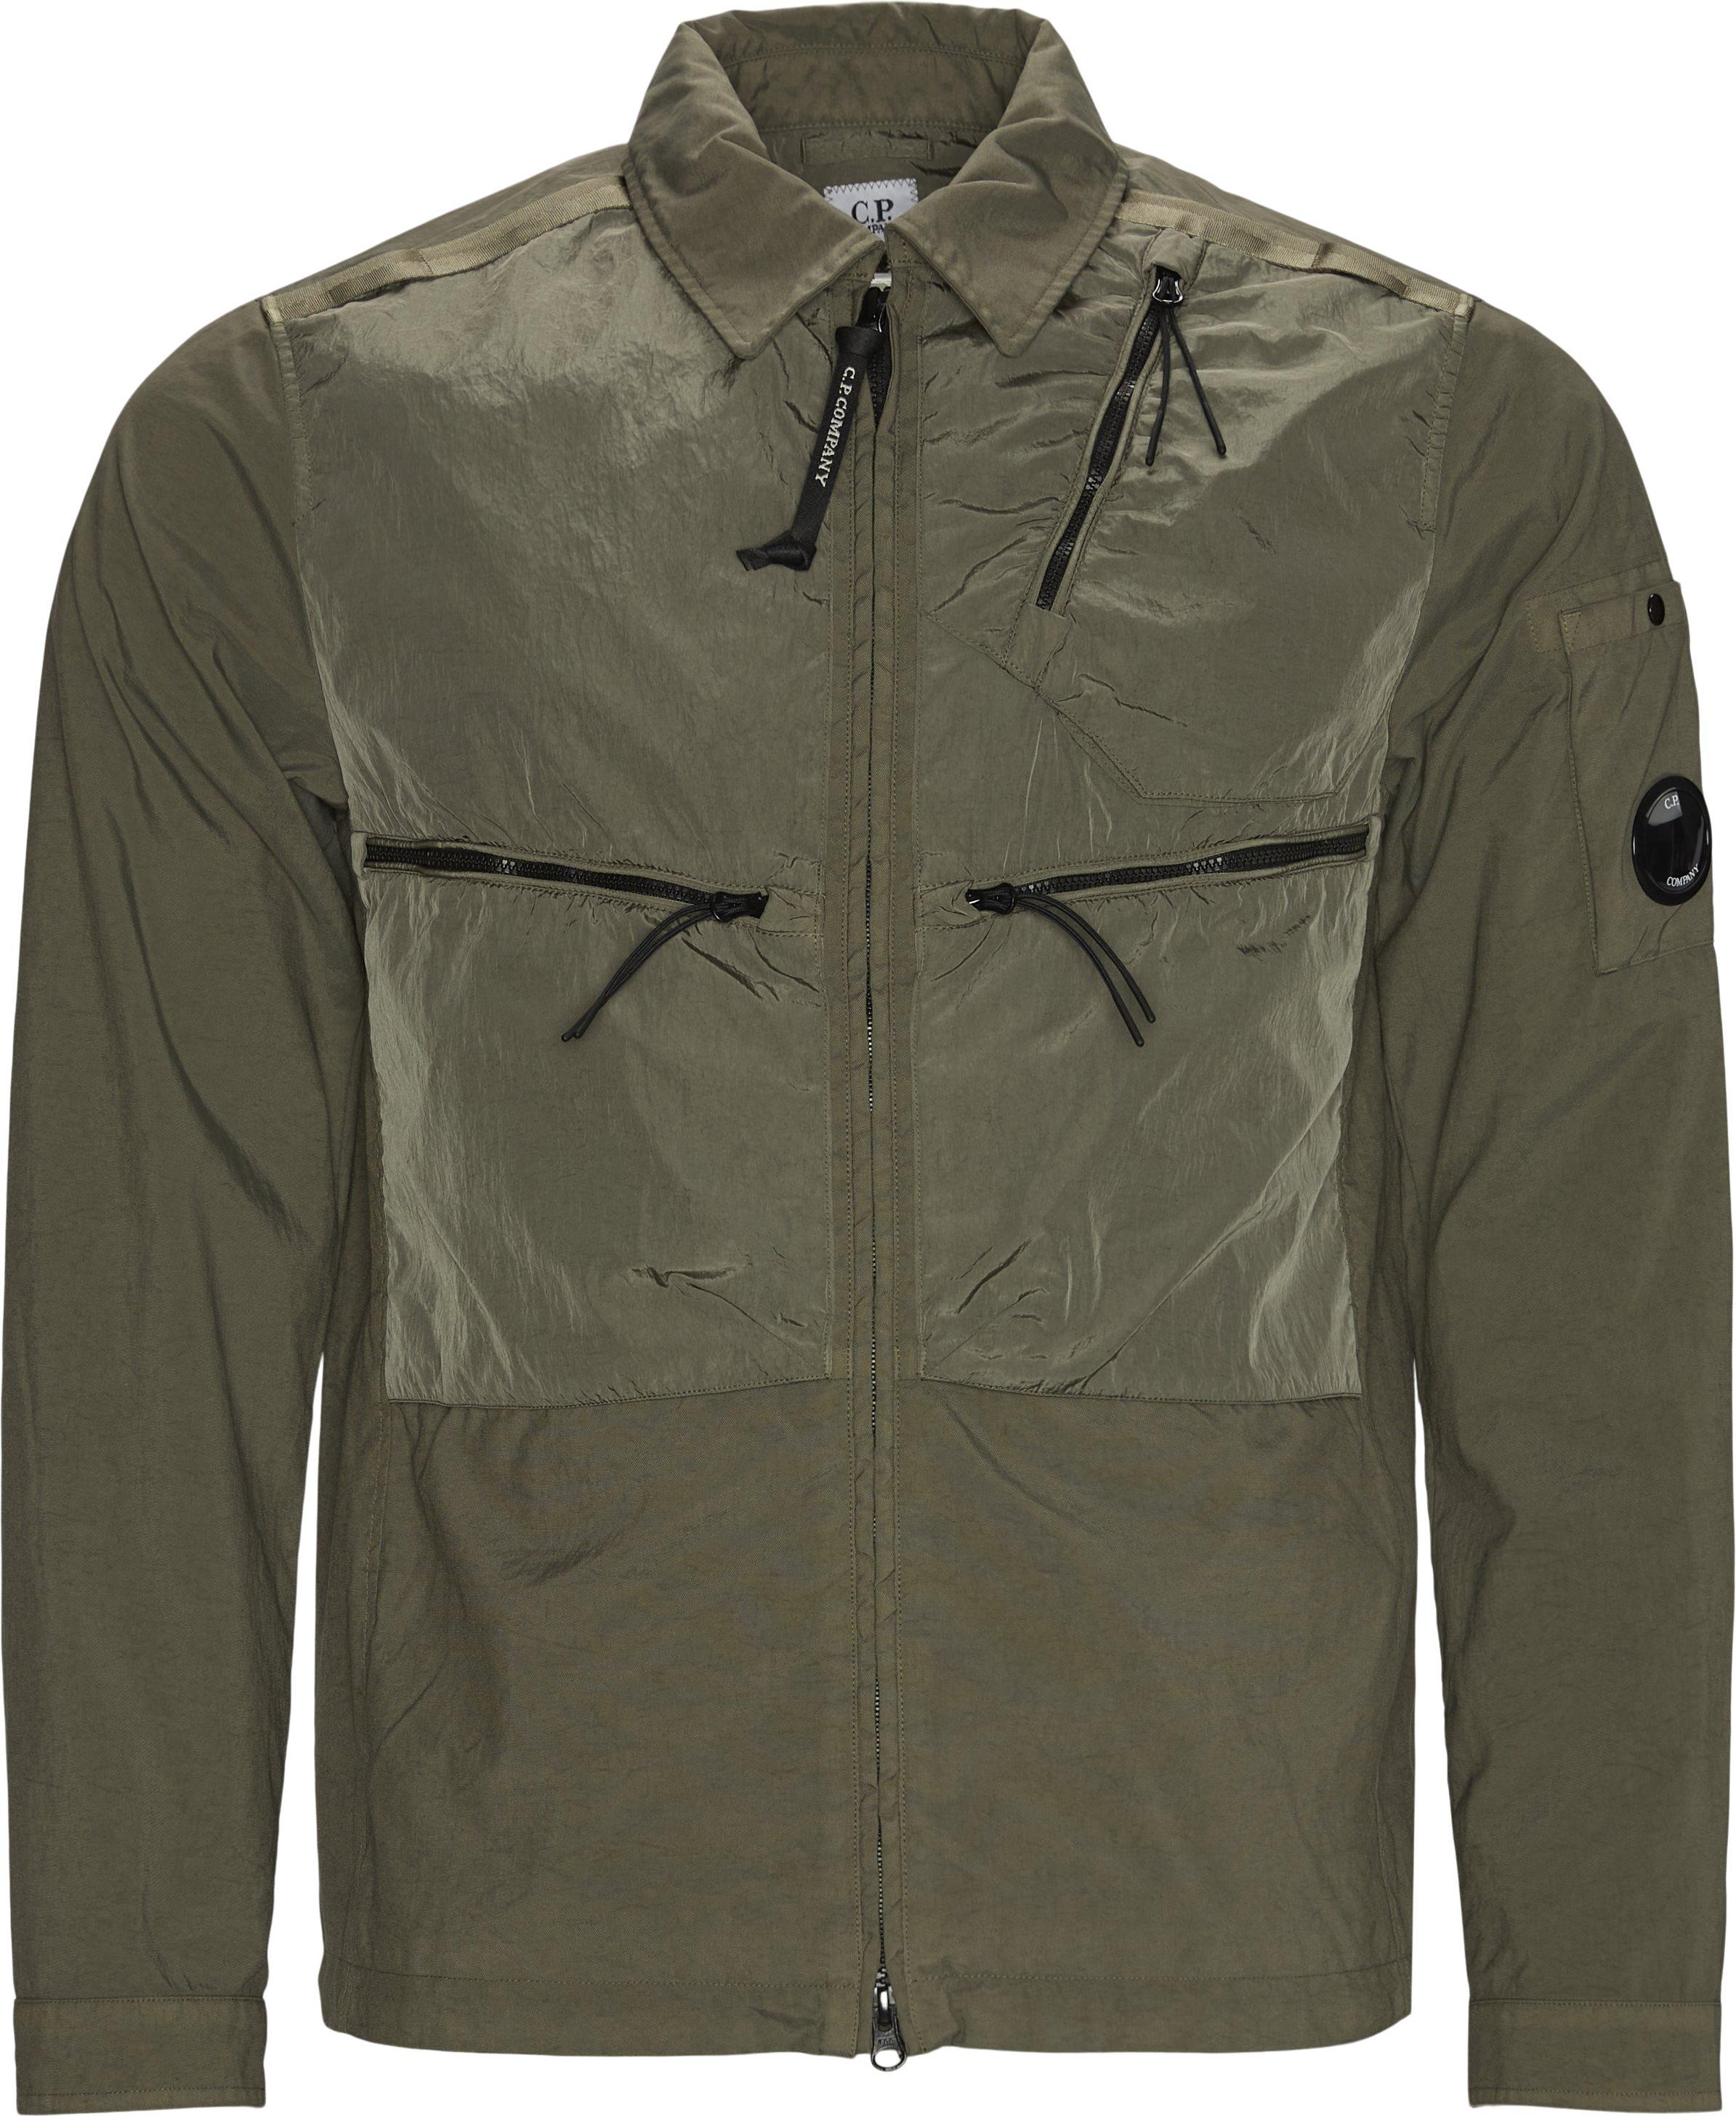 Taylon Mixed Overshirt - Skjorter - Regular fit - Army